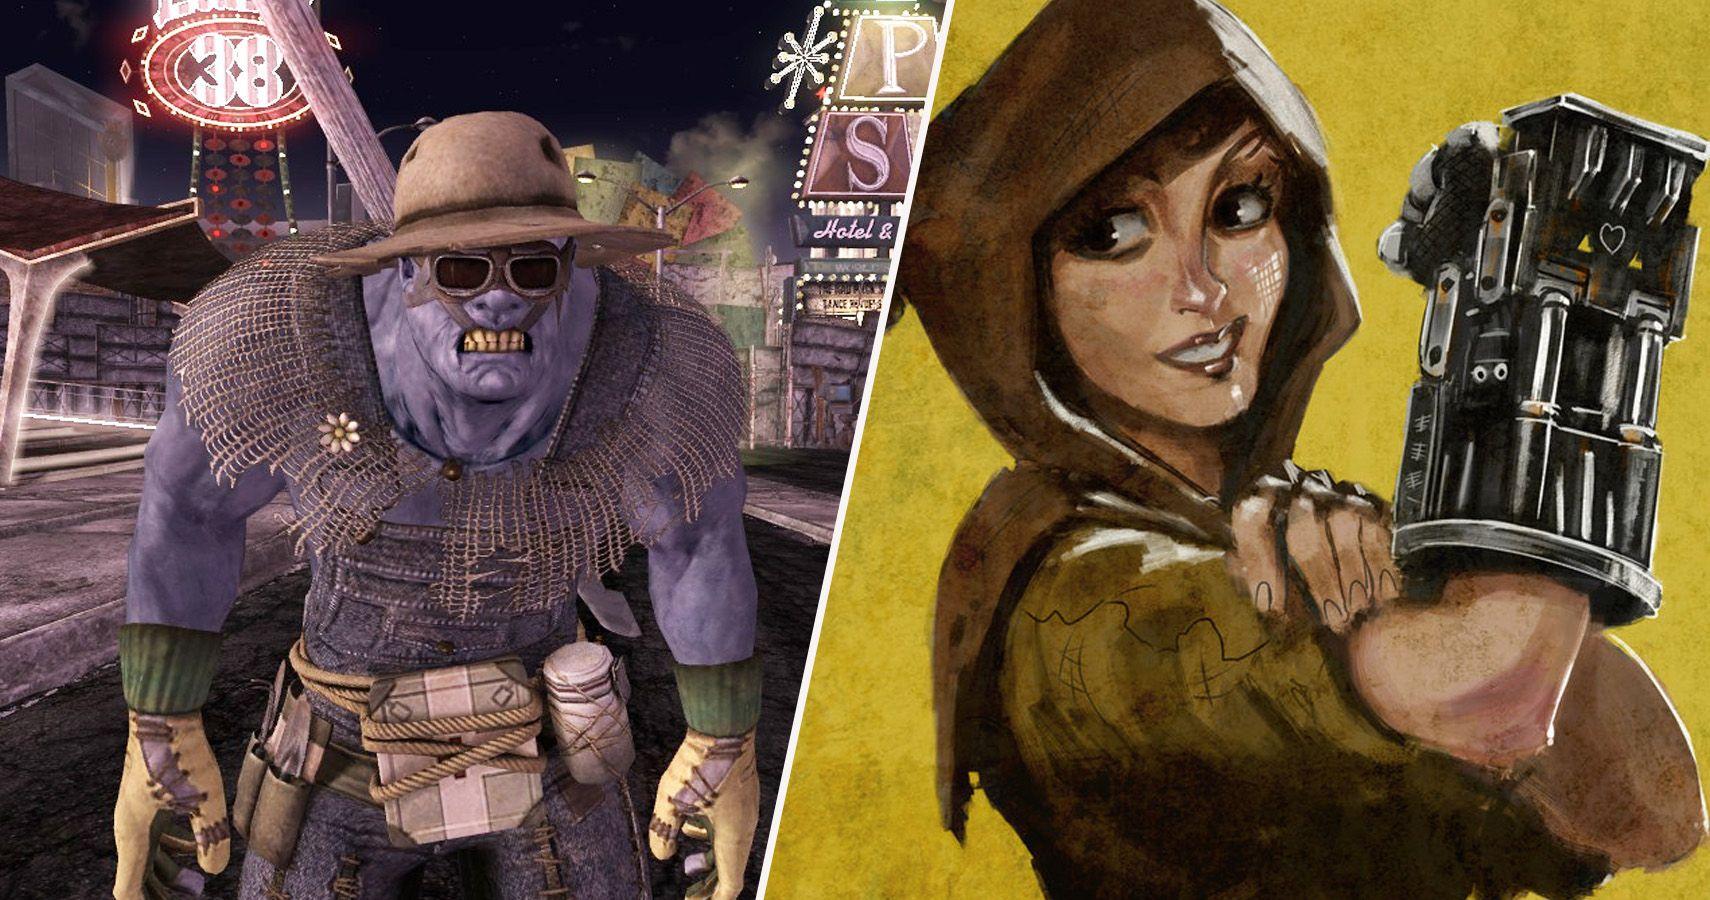 57c3dca0e446d Fallout  New Vegas  25 Things About The Companions That Make No Sense